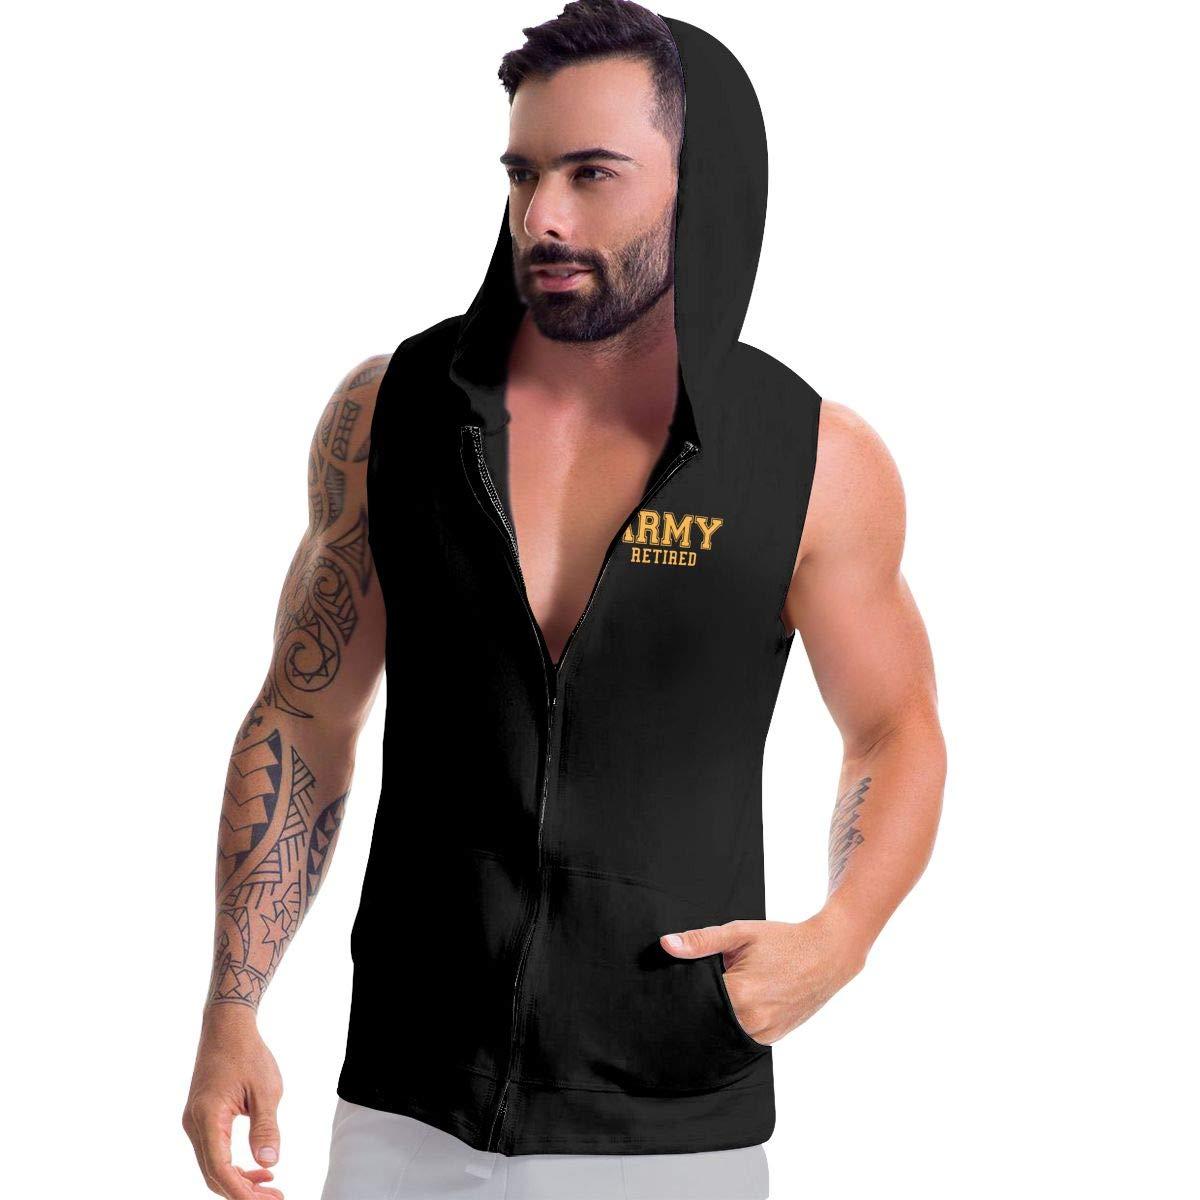 BB/&YYY Army Retired Mens Sleeveless Full Zip Fleece Hoodie Bodybuilding Jacket